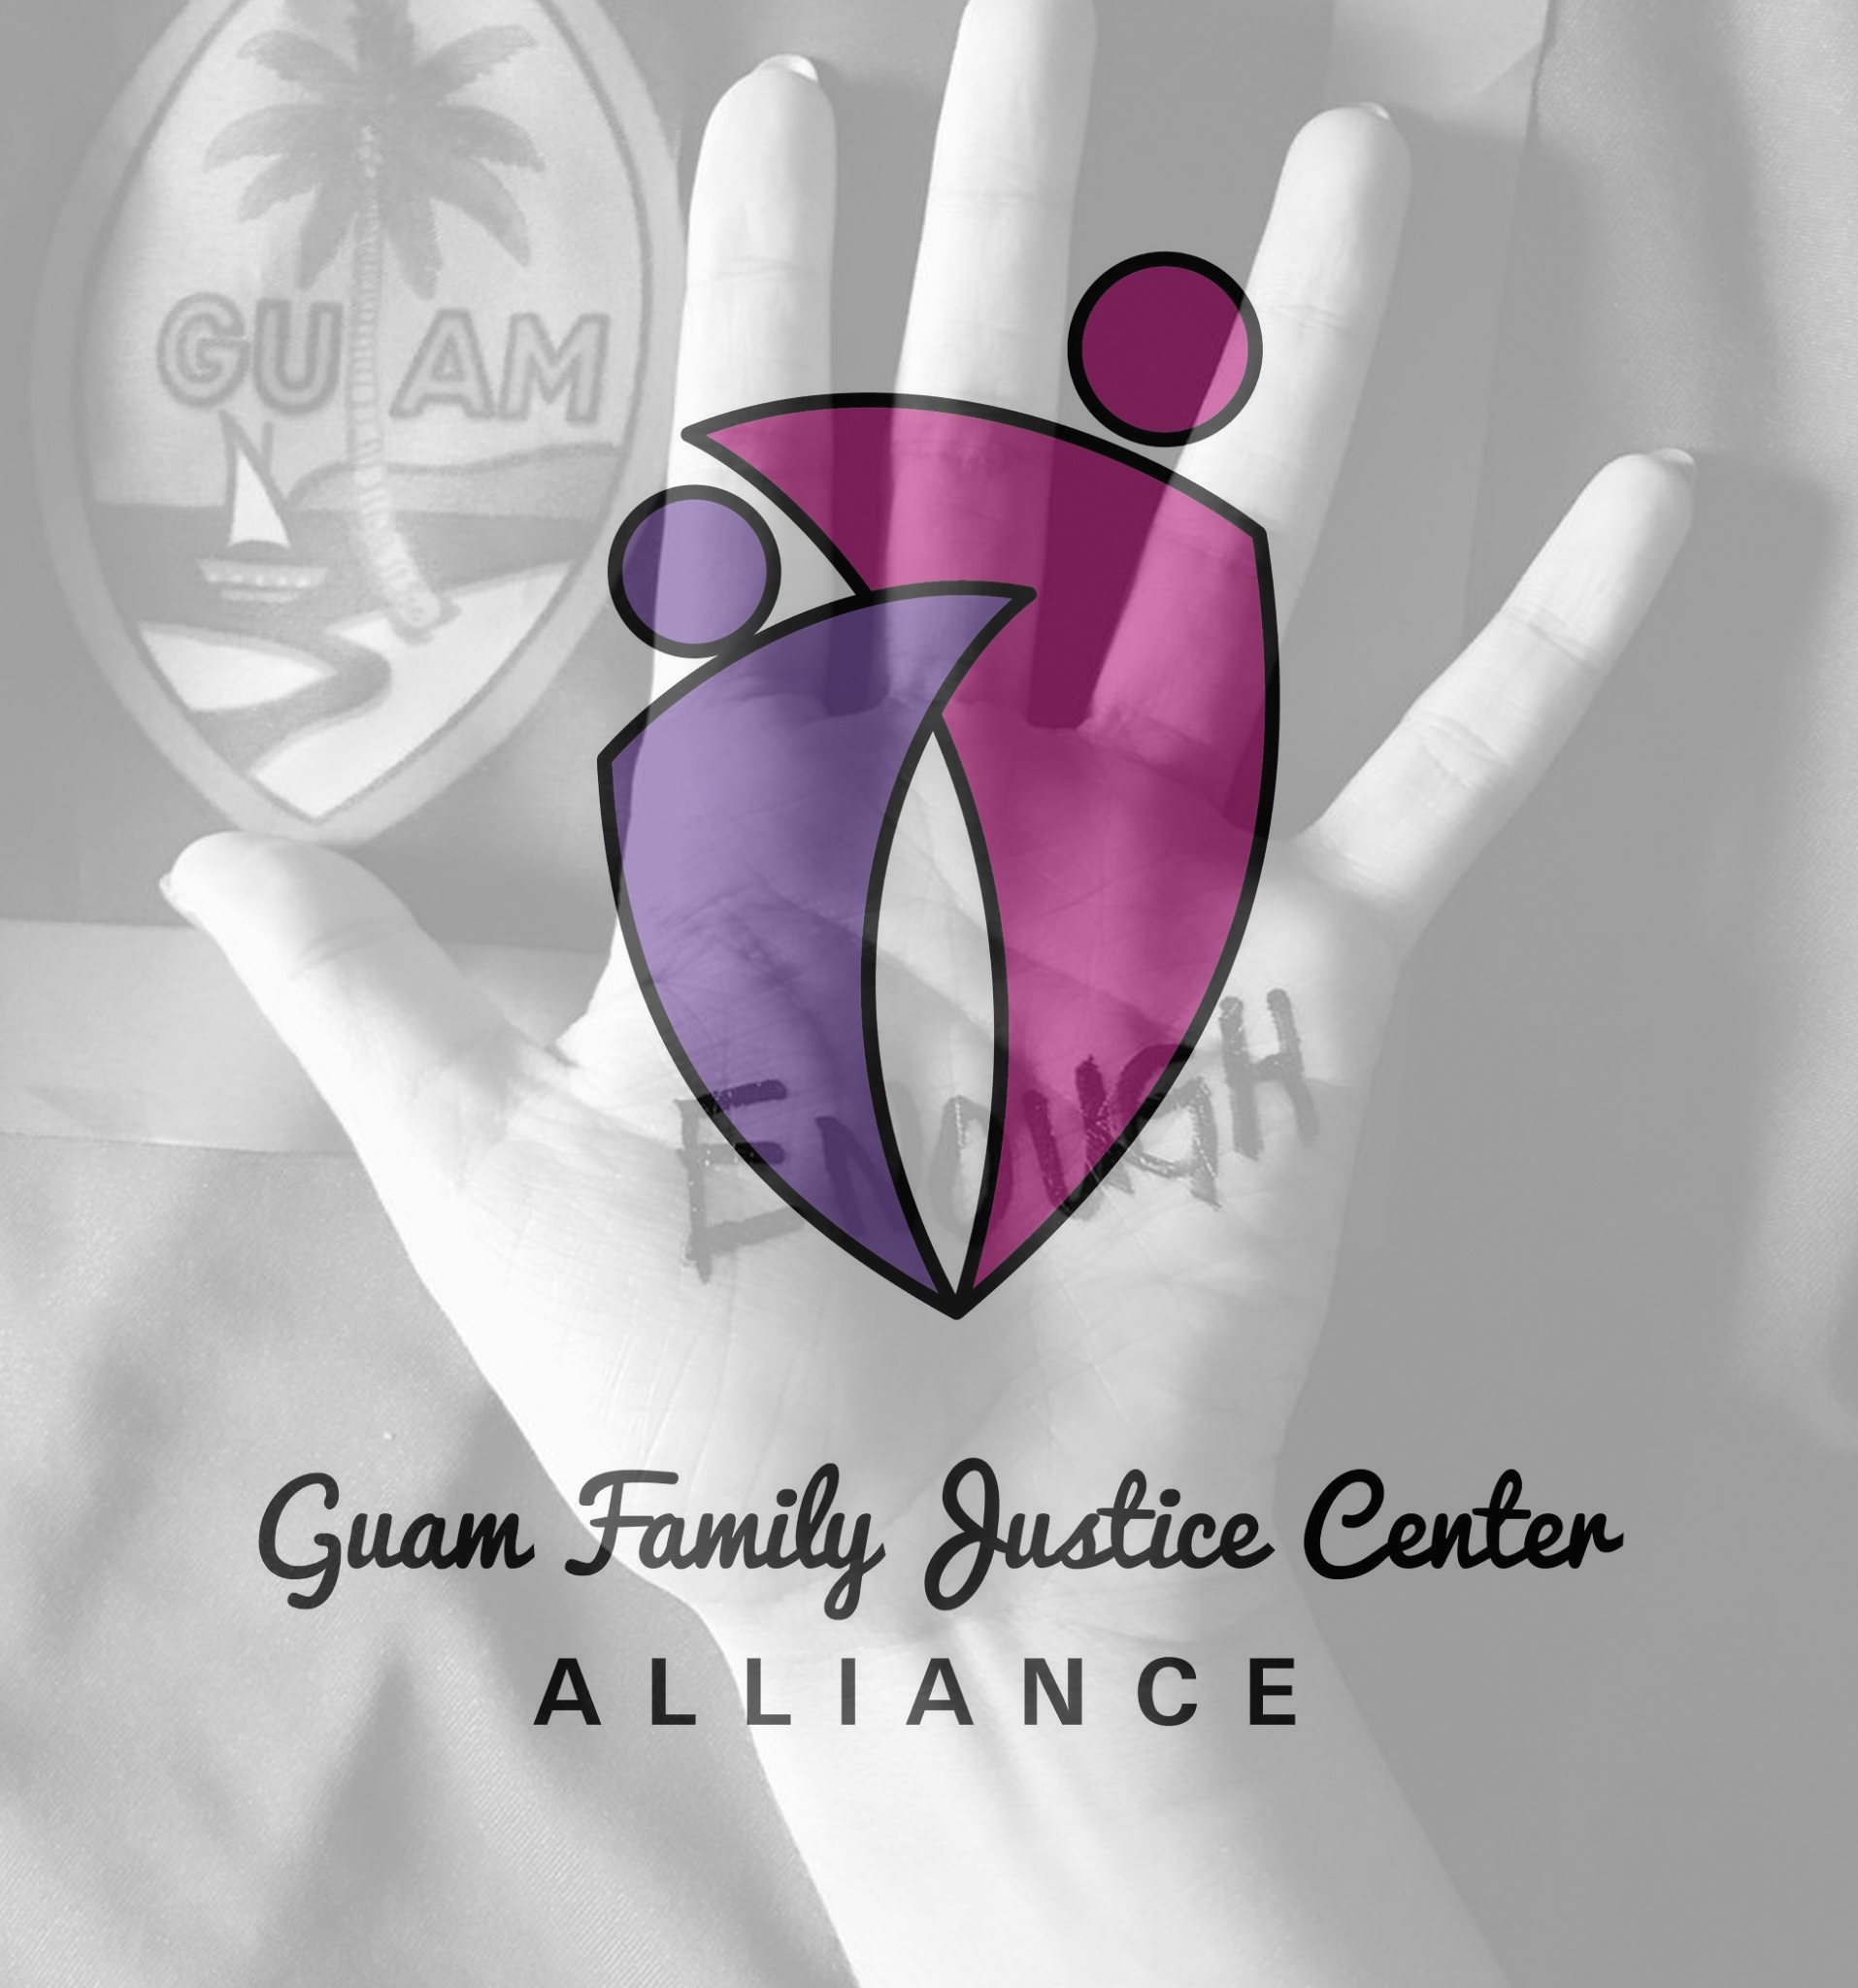 The-Guam-Family-Justice-Center-AllianceREV.jpg